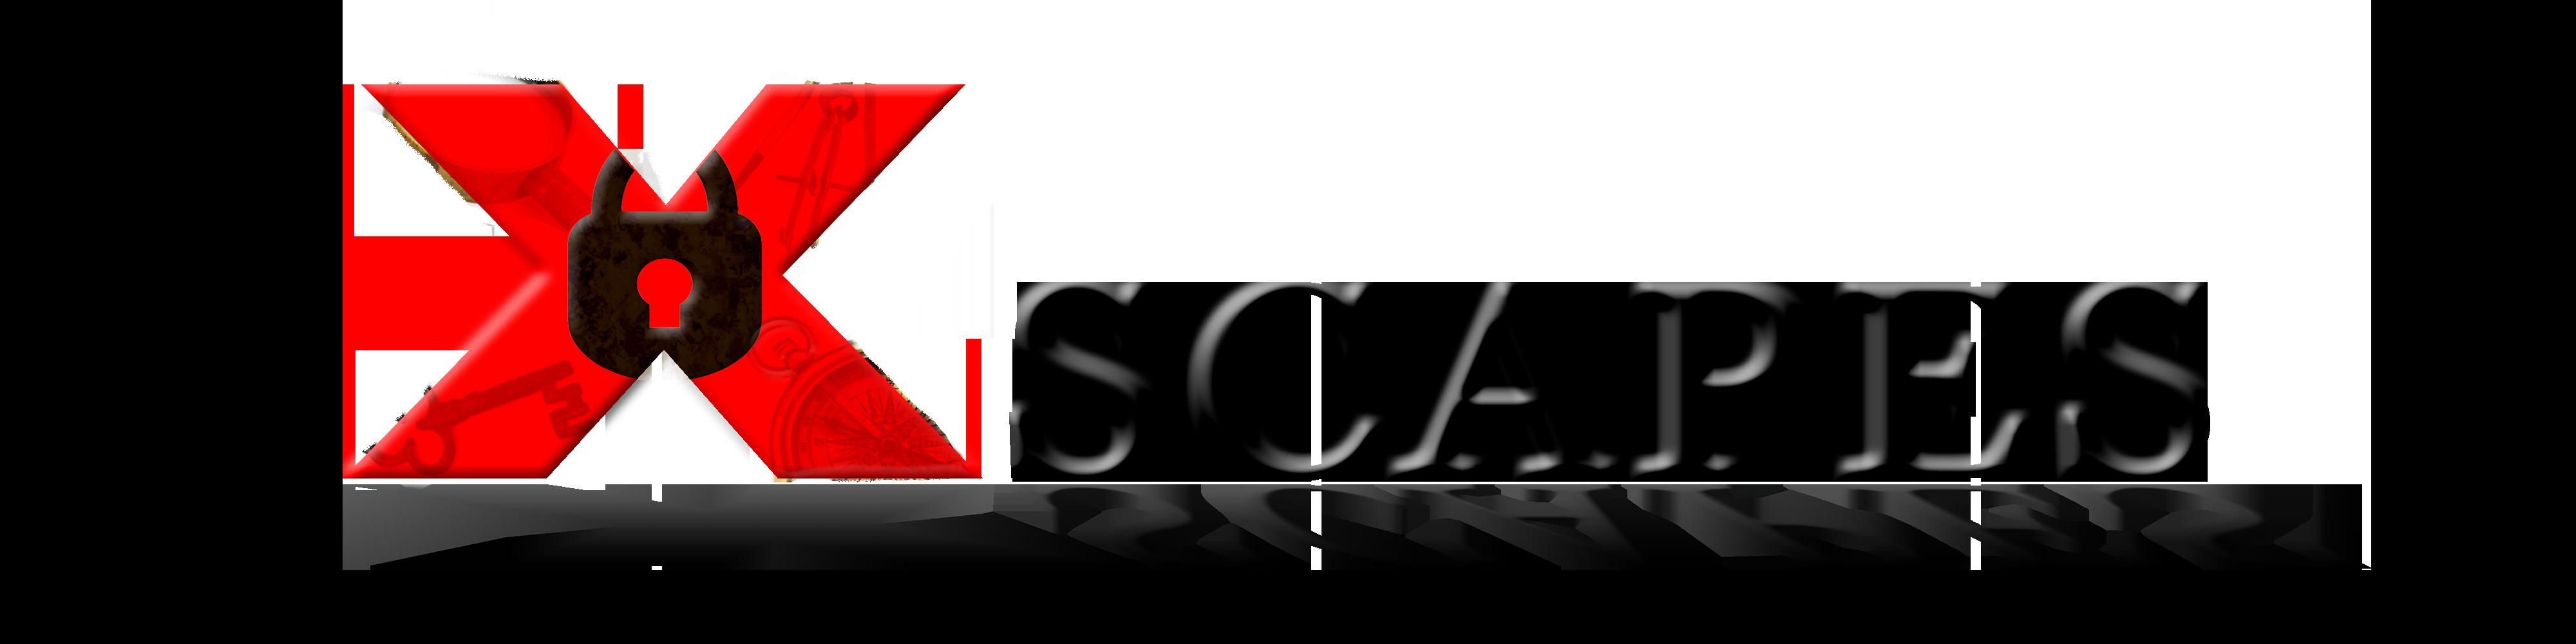 Xscapes